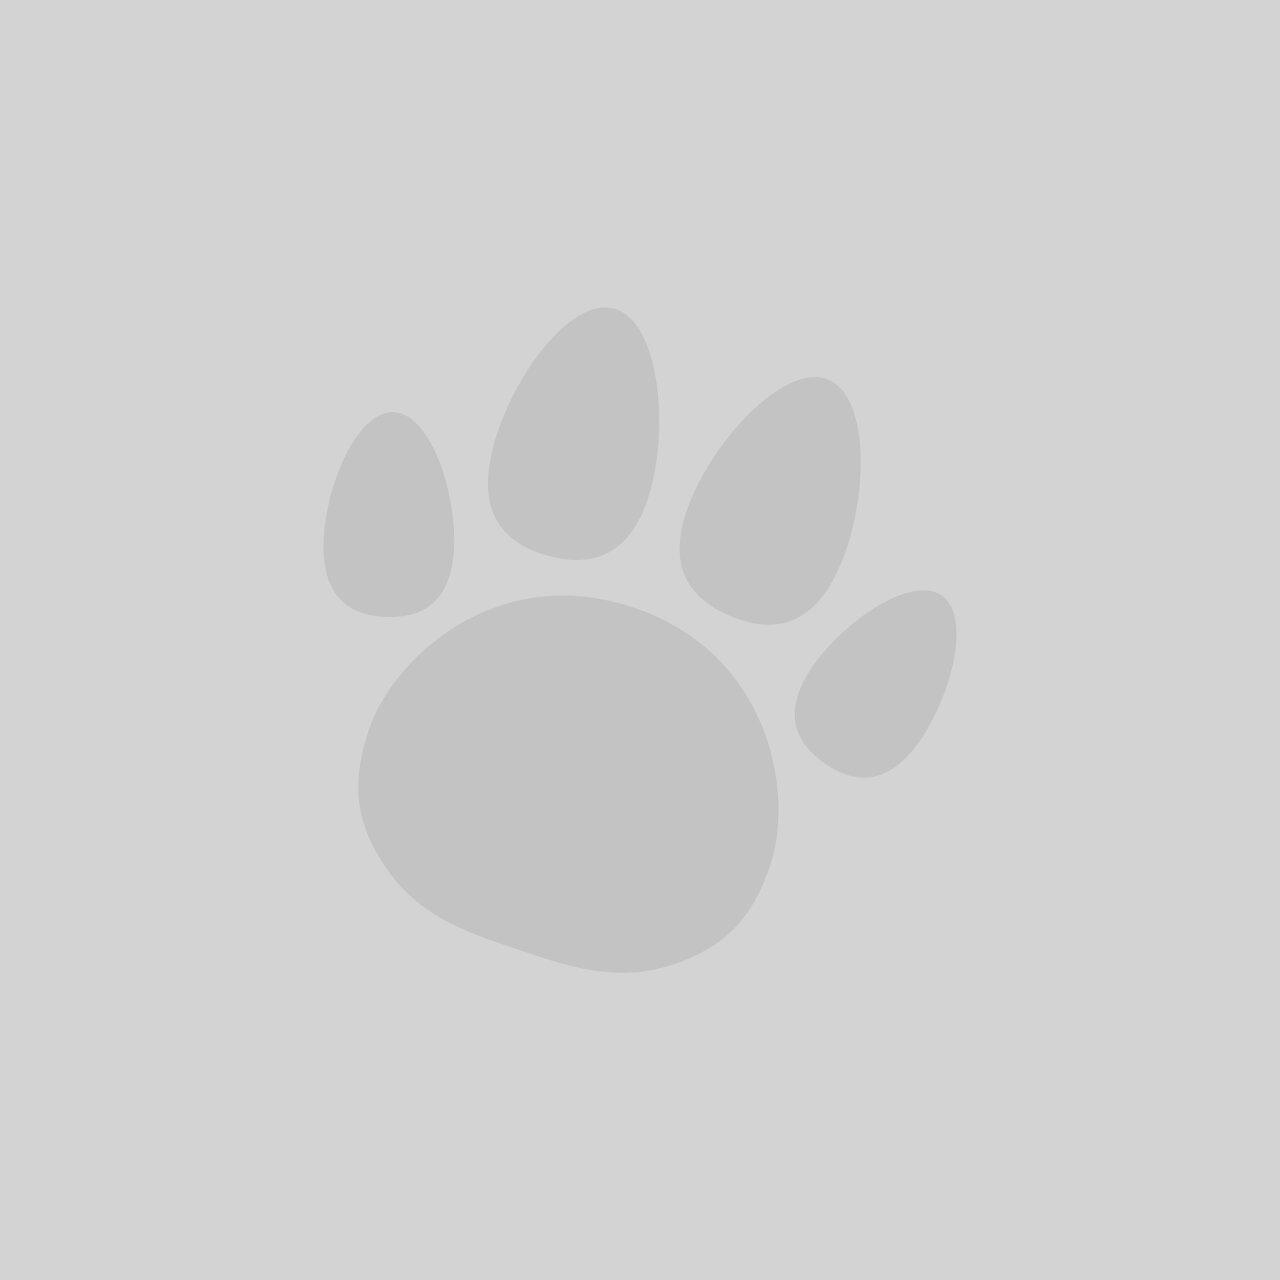 SureFlap Microchip Cat Flap White